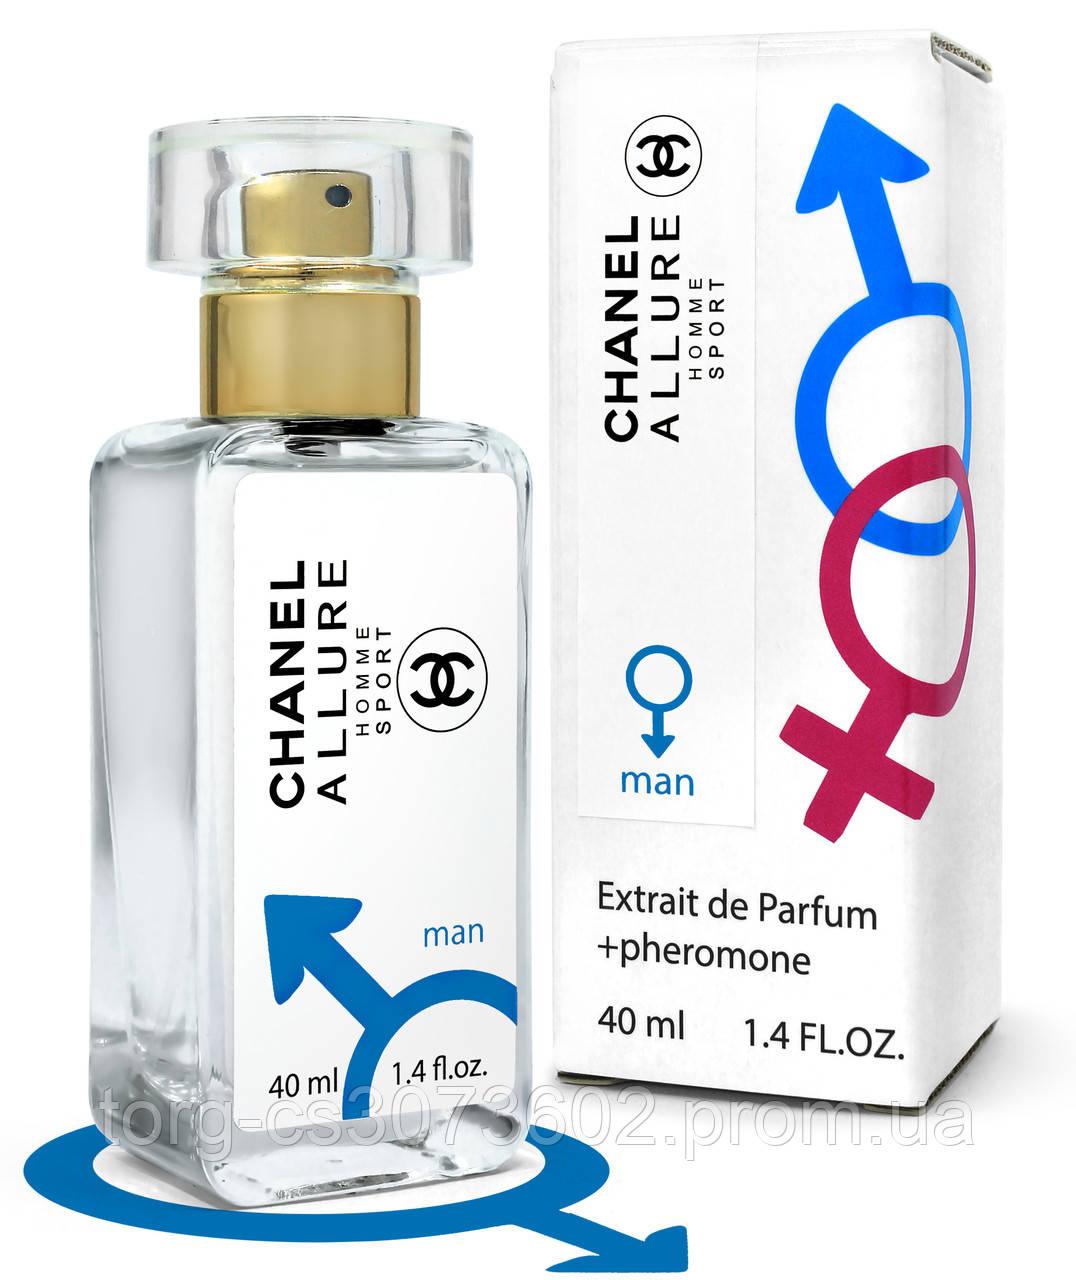 Тестер Pheromone чоловічий Chanel Allure Homme Sport, 40 мл